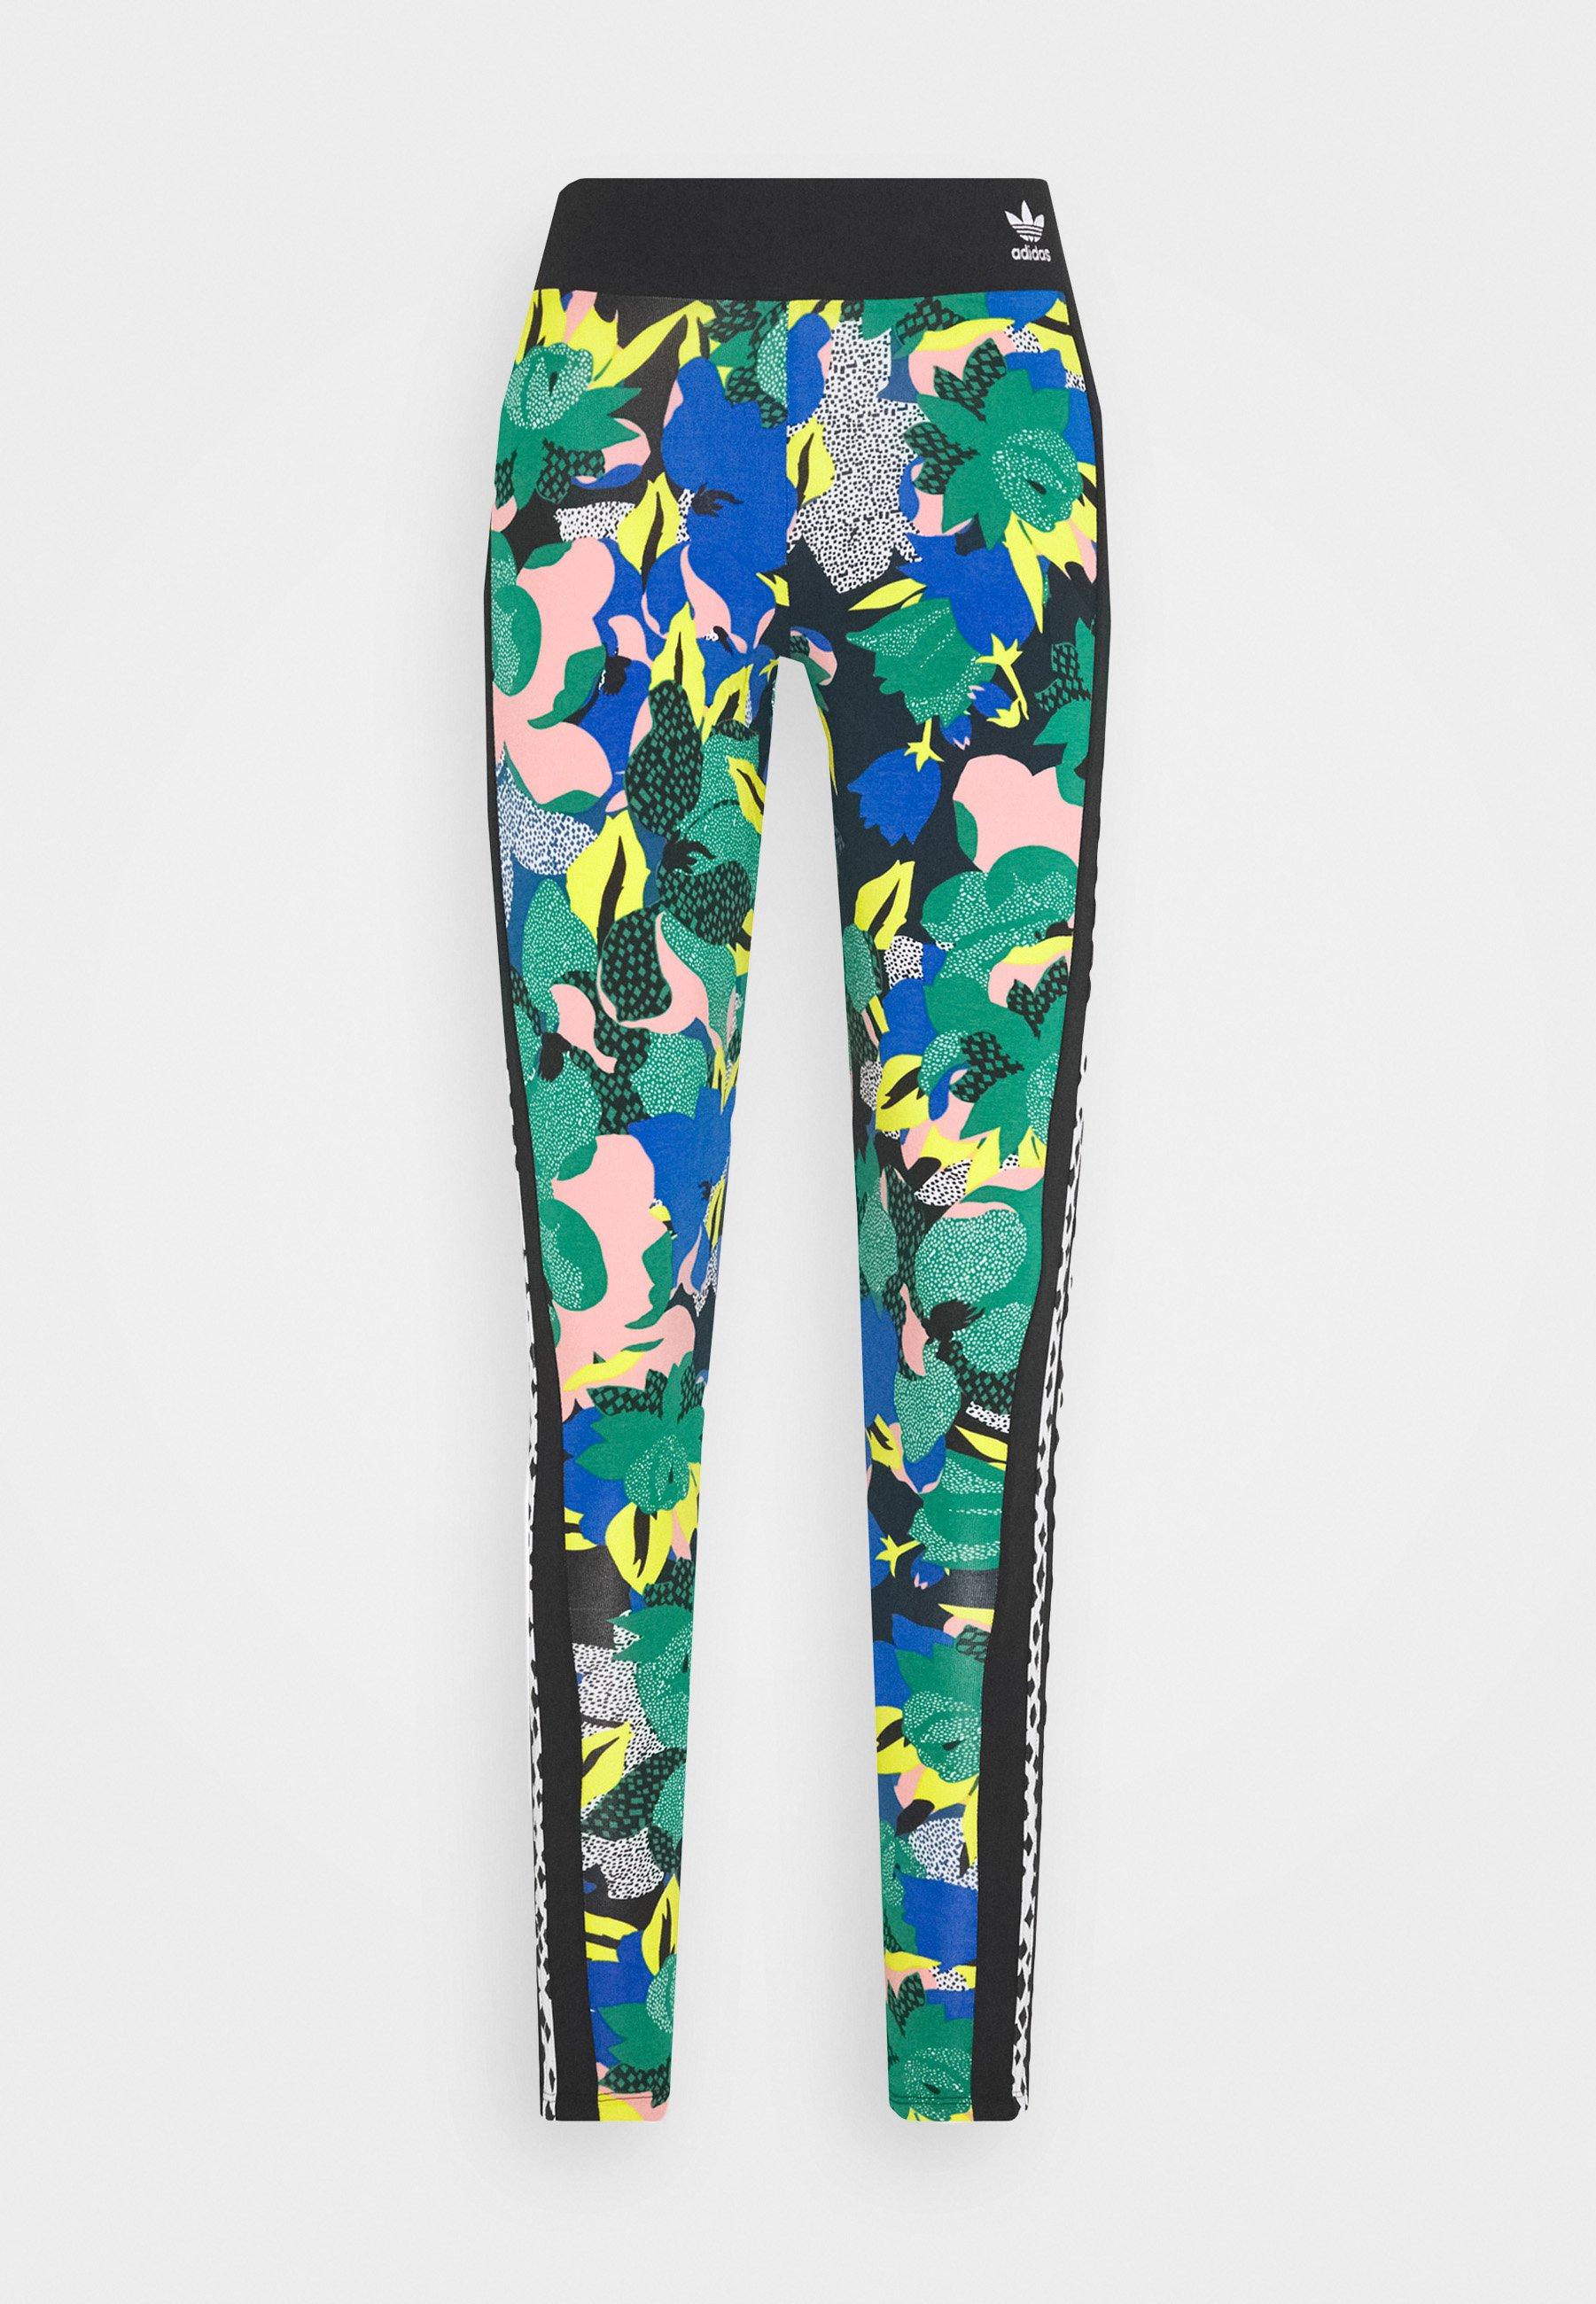 Adidas Originals Leggings Multicolor schwarz, 27,95 €